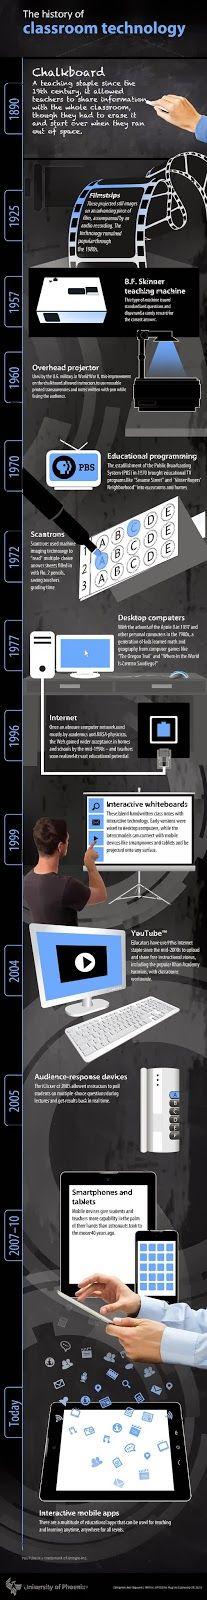 educomunicacion.com: La historia de la tecnología en el aula, en una imagen #infografia